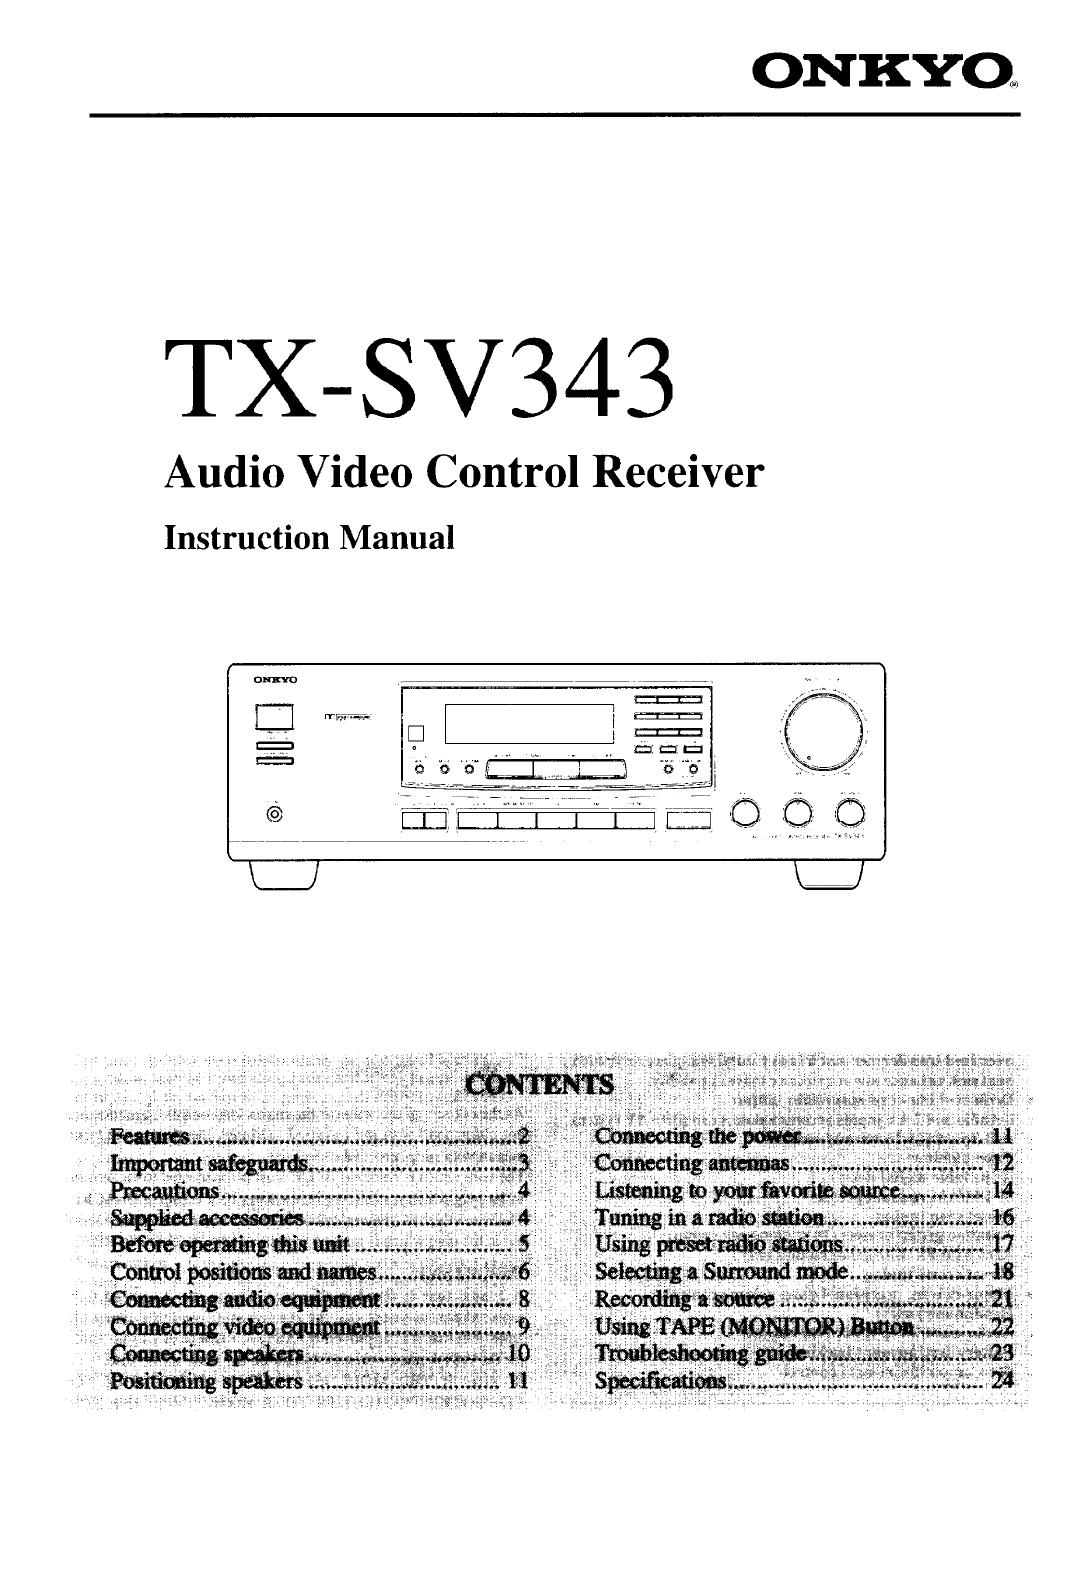 onkyo tx sv343 manual rh pdfmanualer dk Onkyo TX5 Onkyo TX 8511 Manual